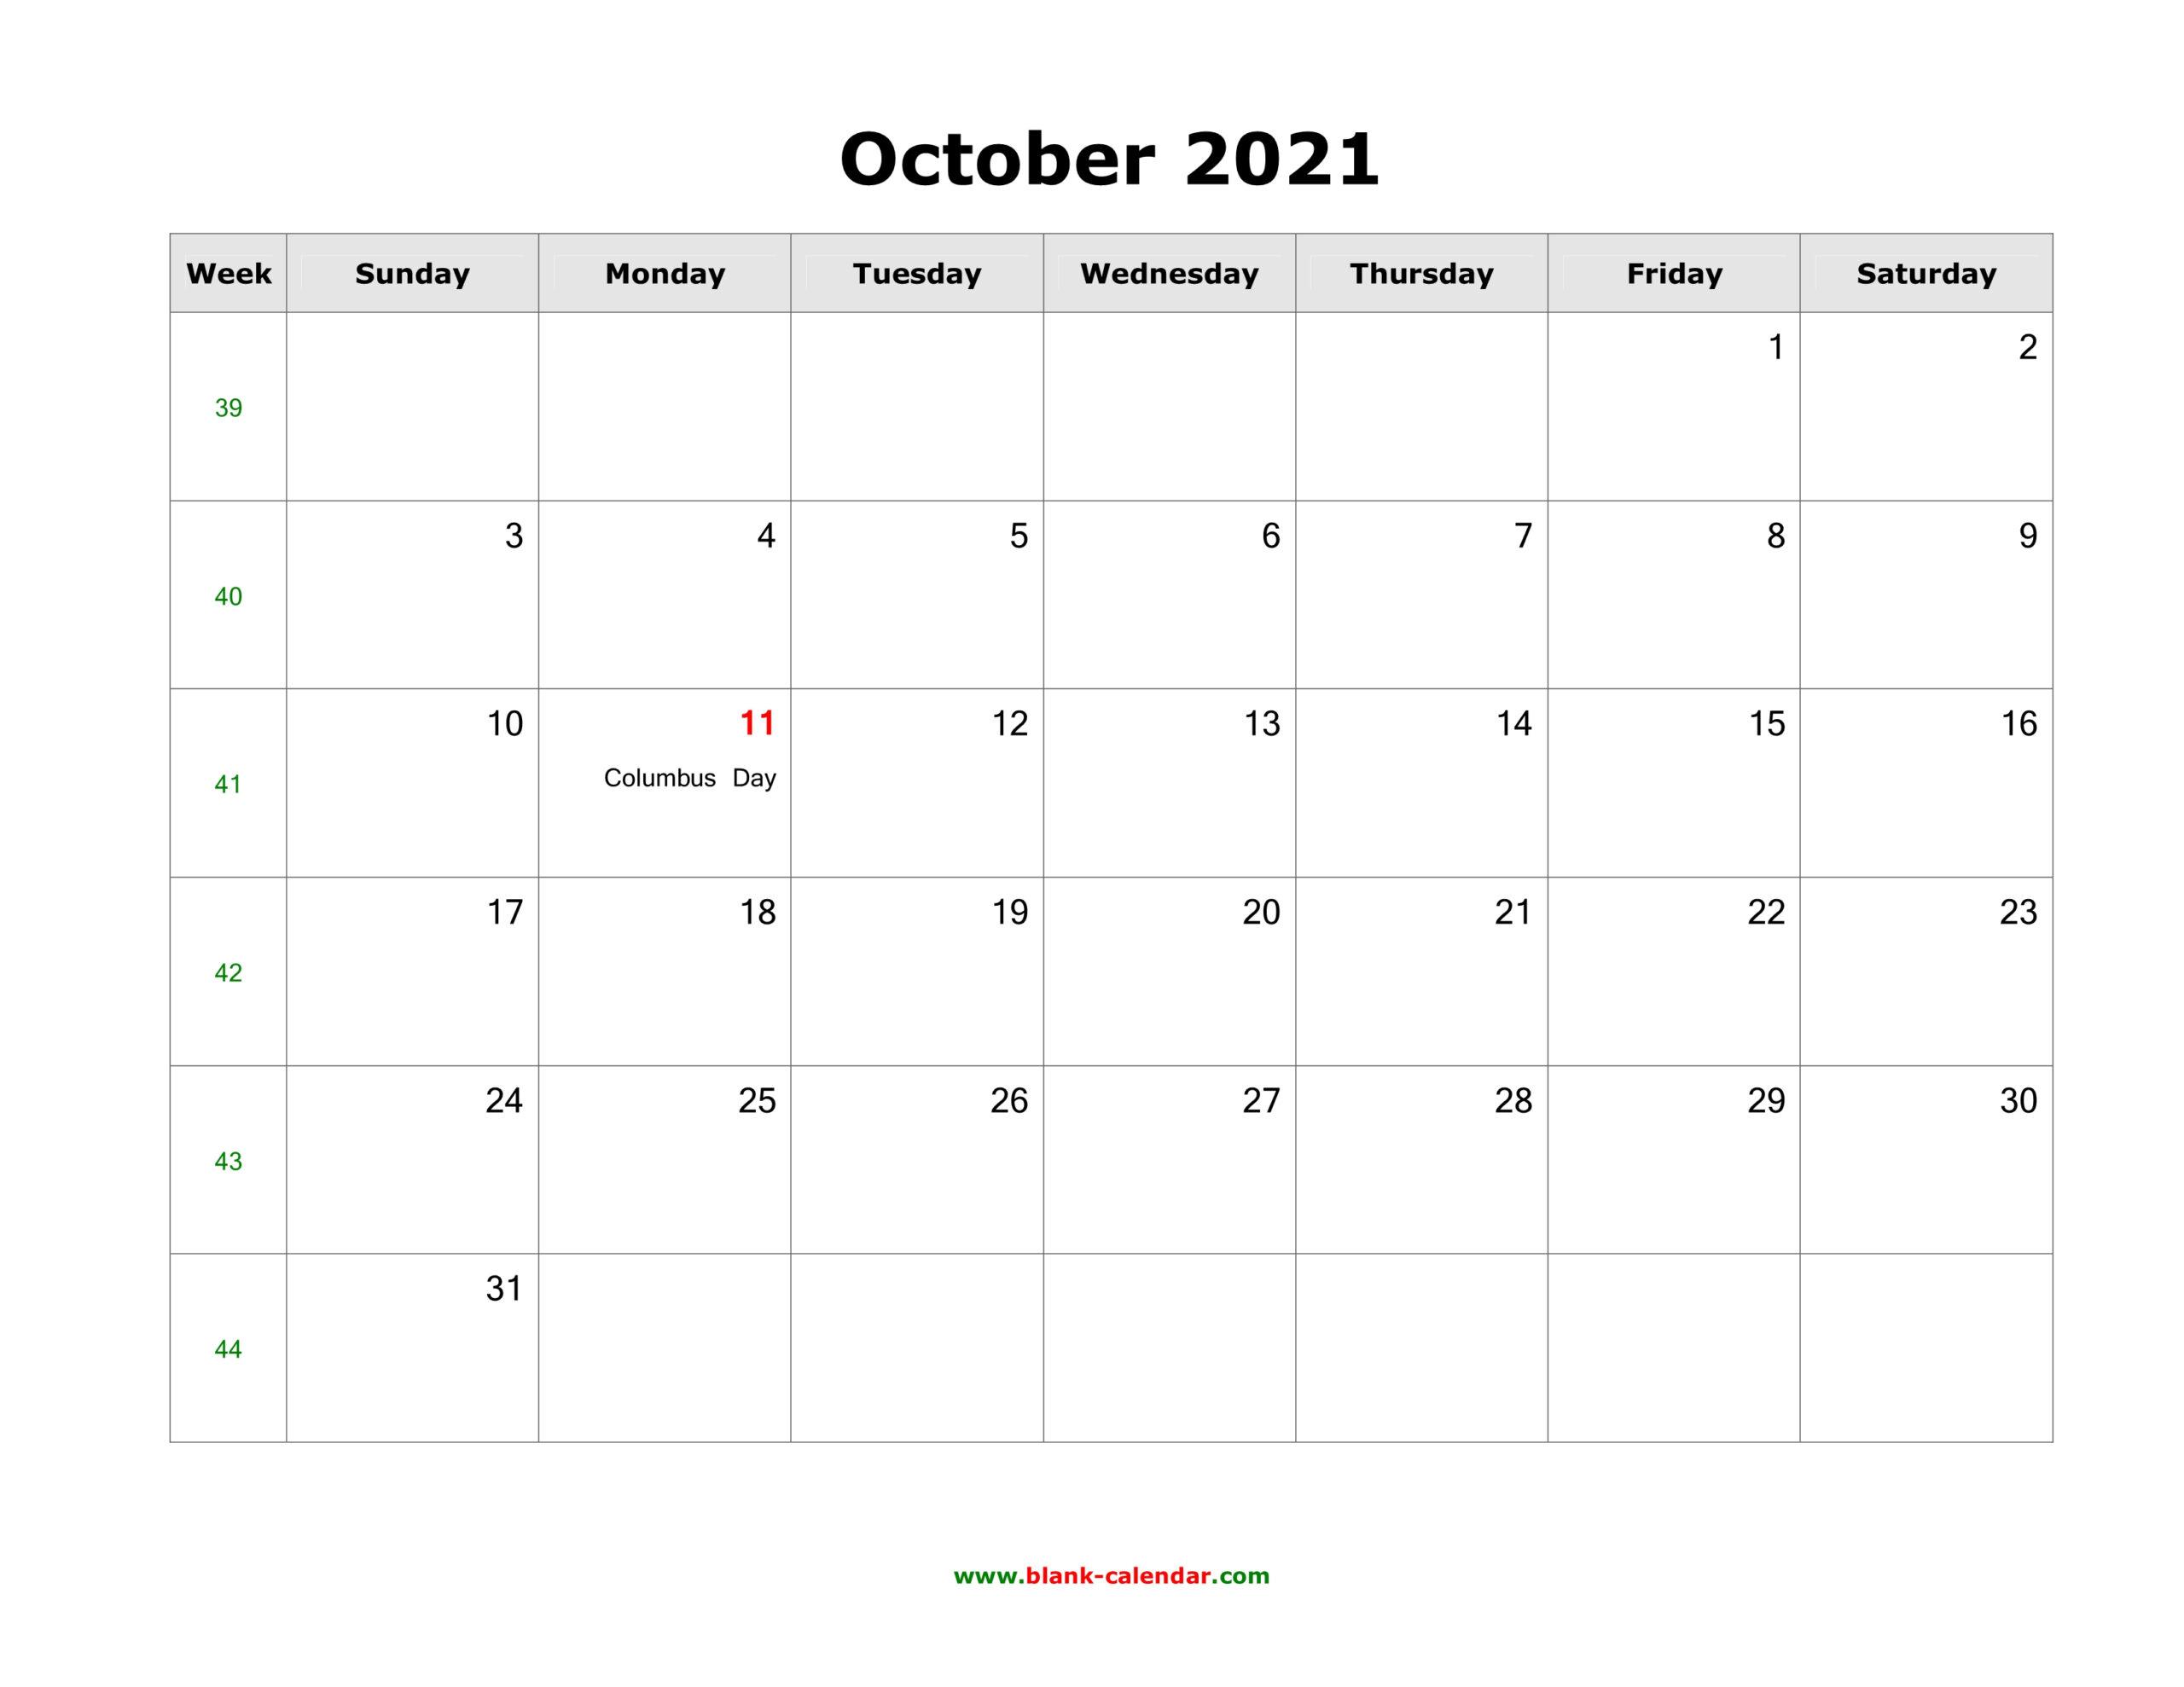 October 2021 Blank Calendar | Free Download Calendar Templates